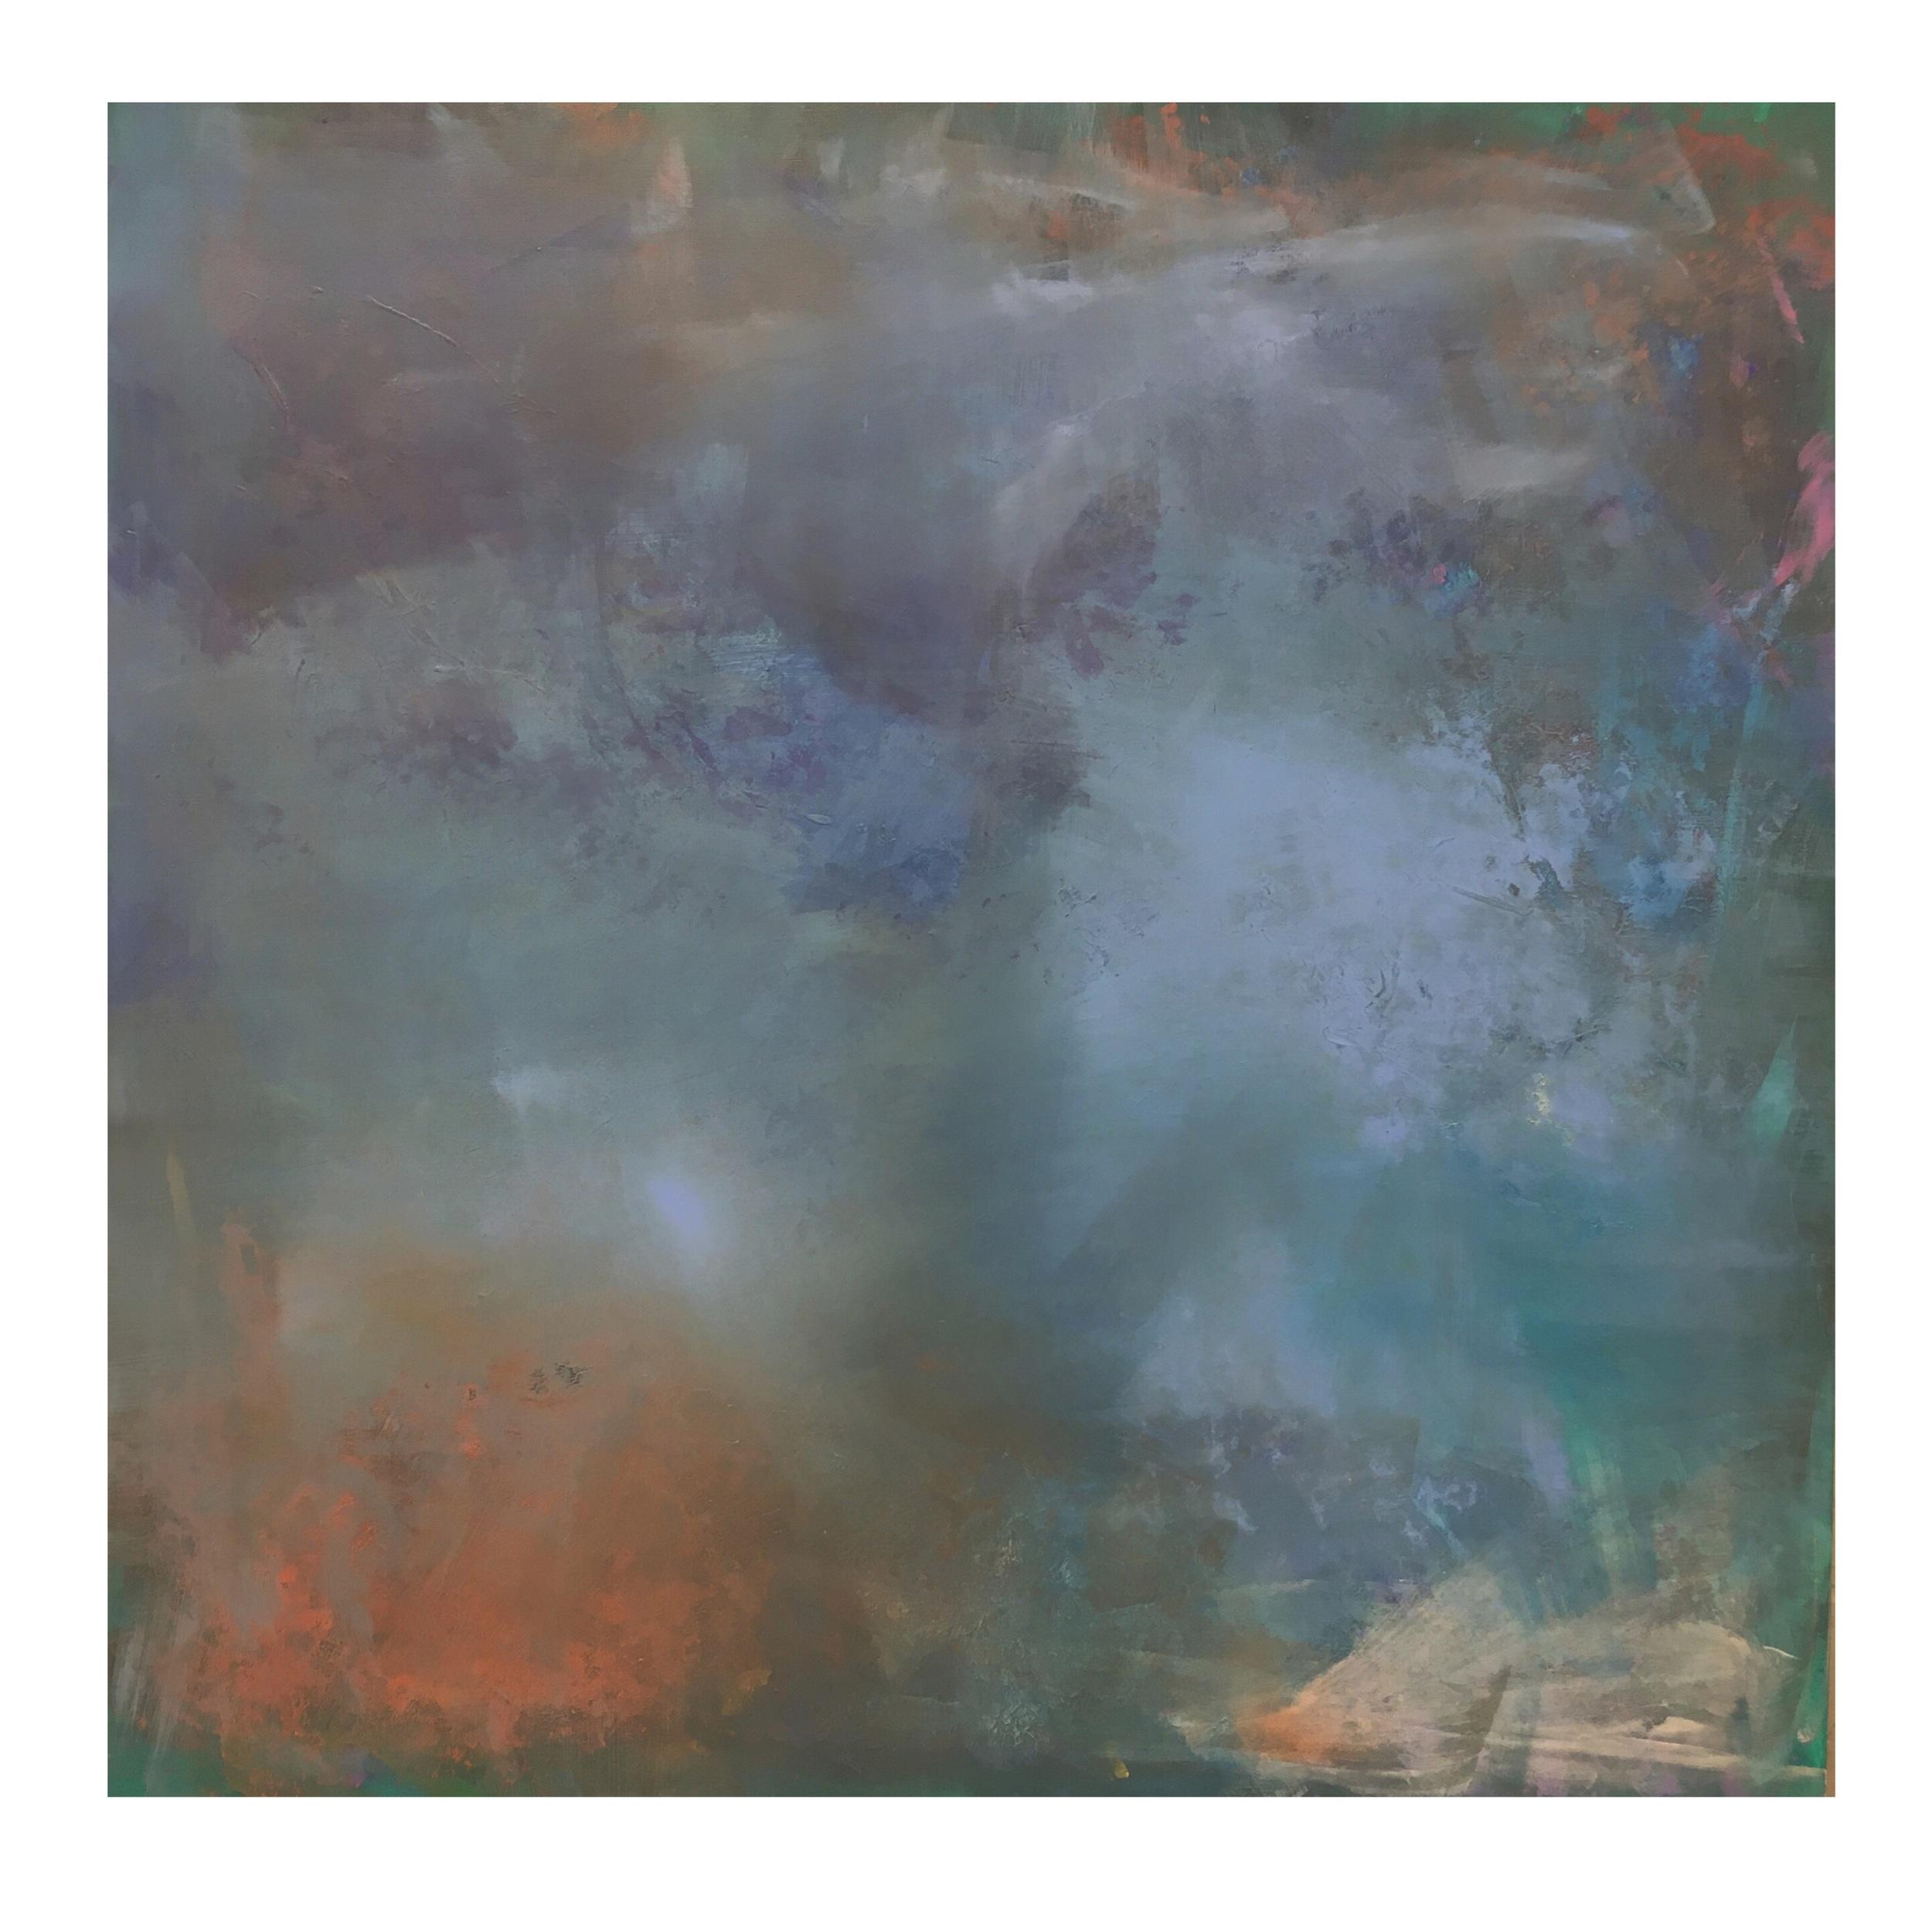 Mixed media on canvas 54x54